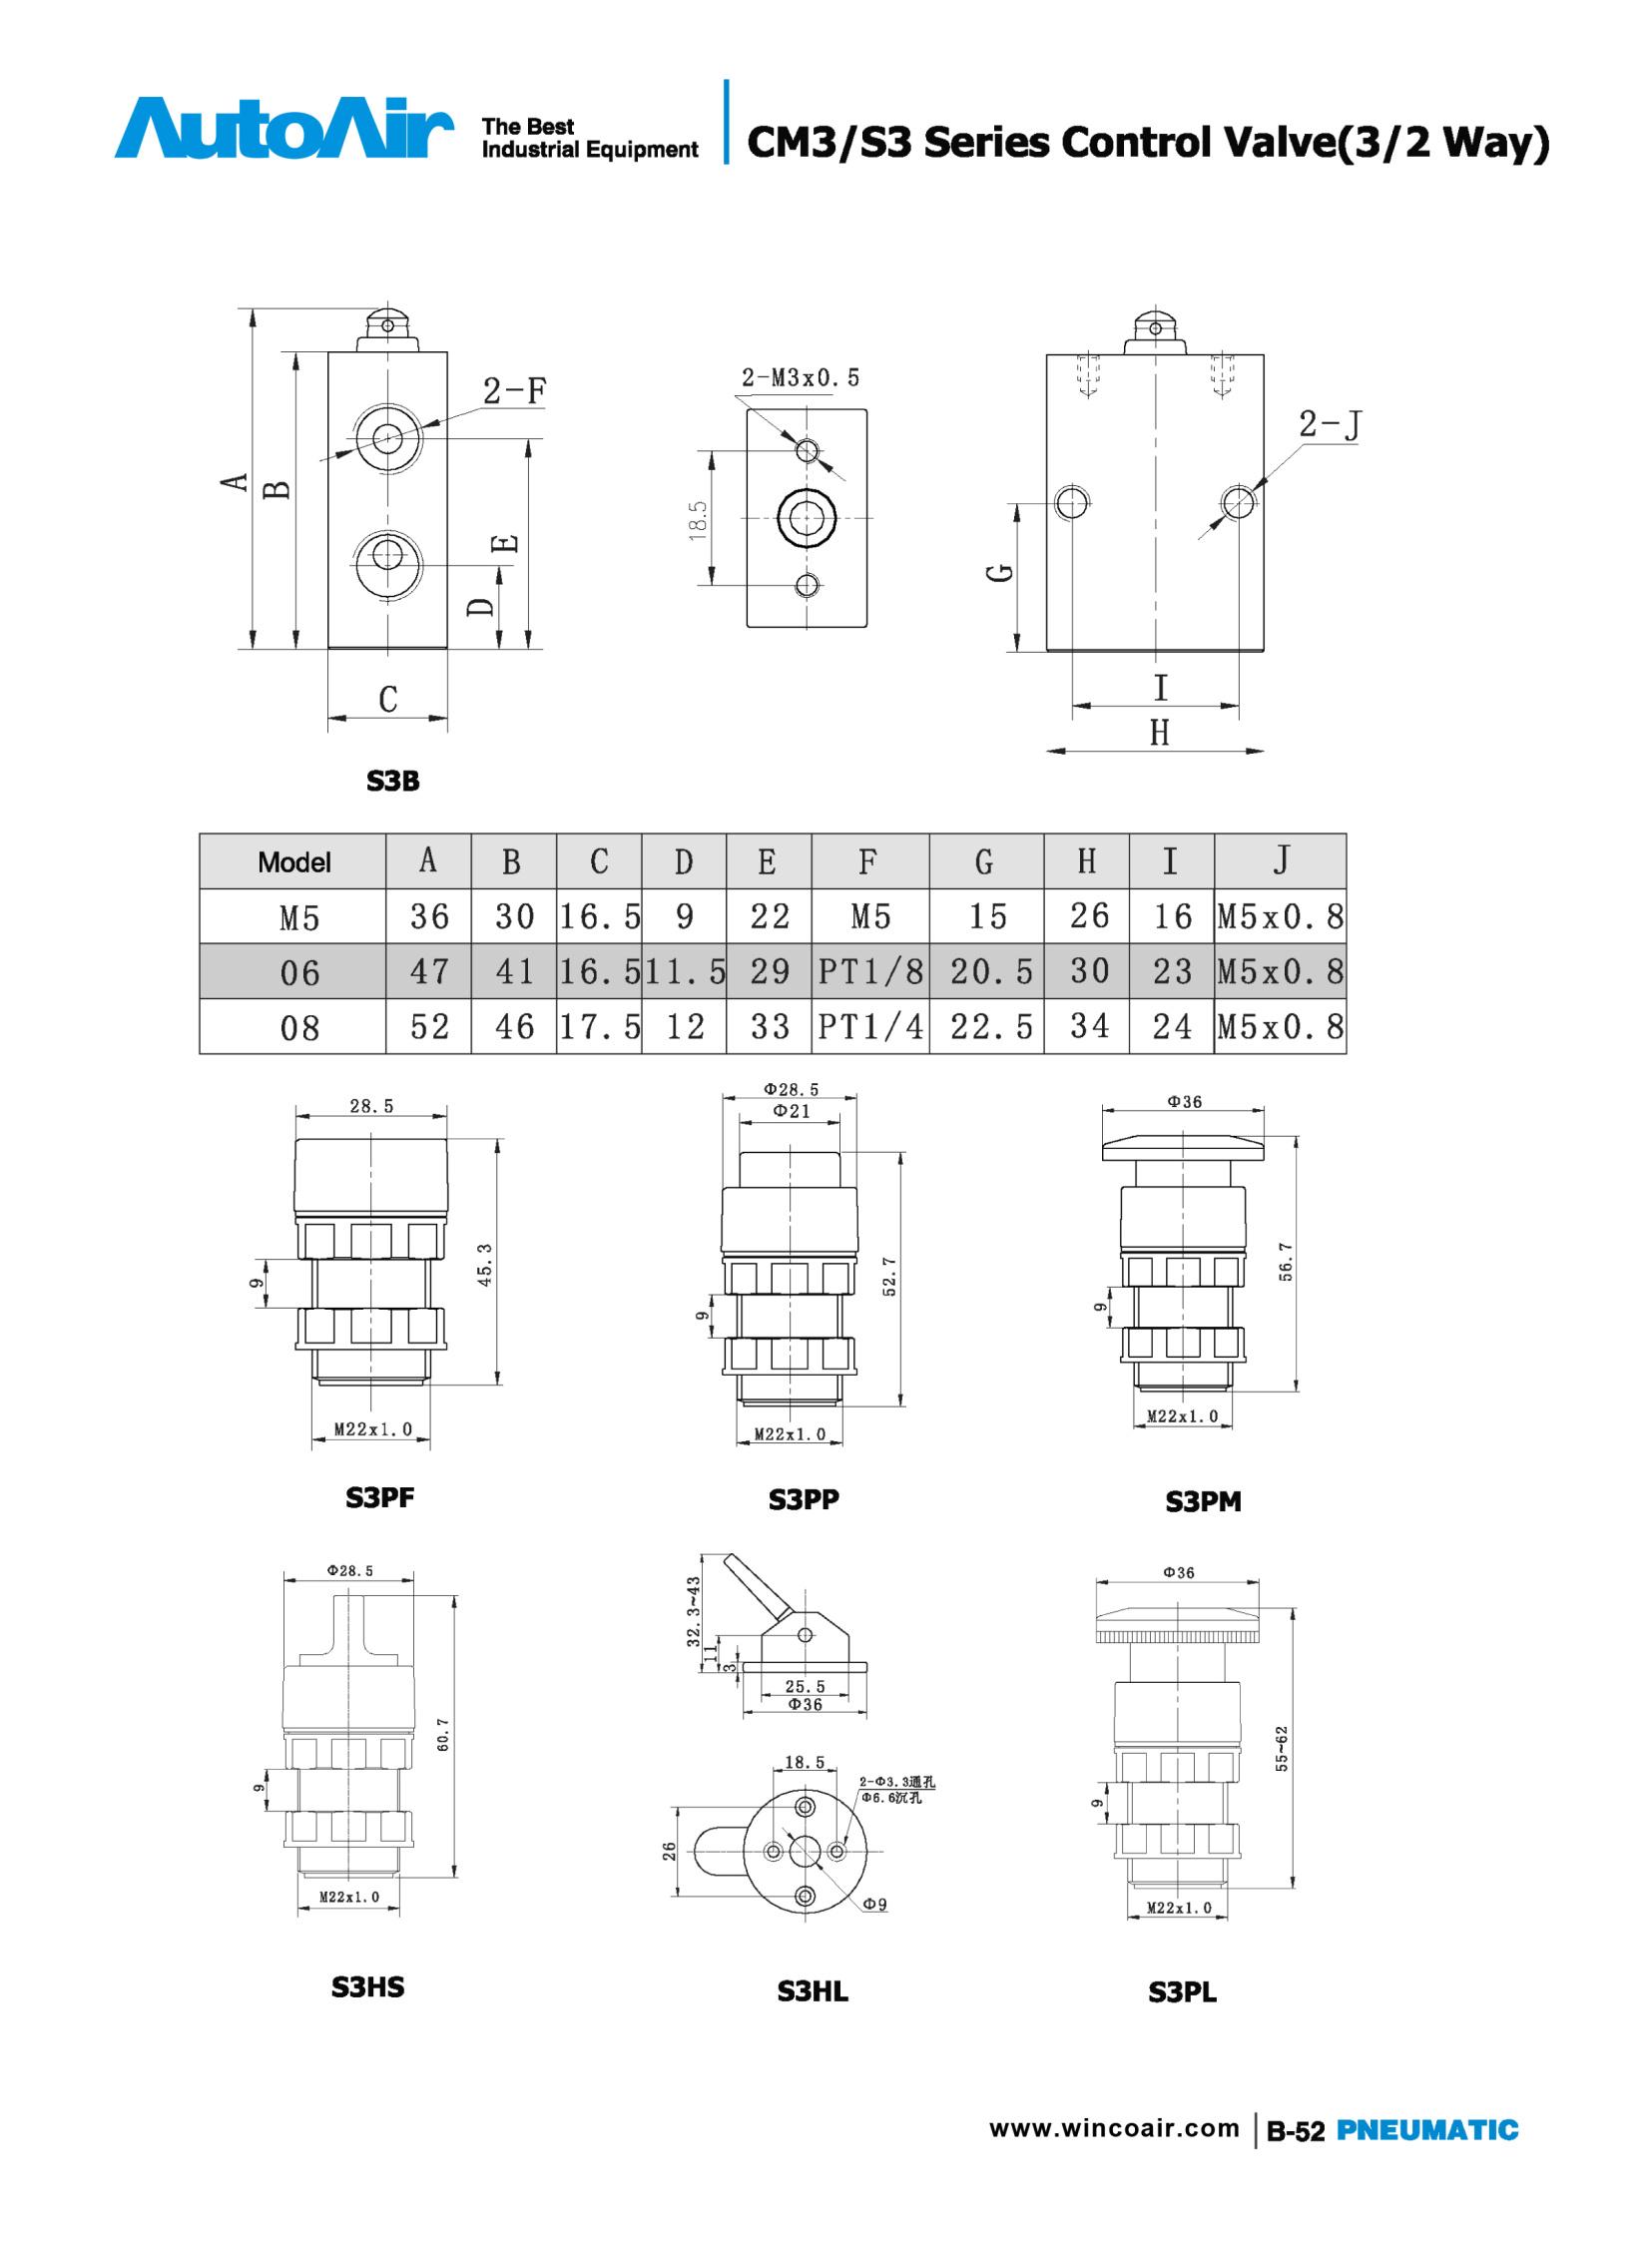 Solenoid valve(52)(1)